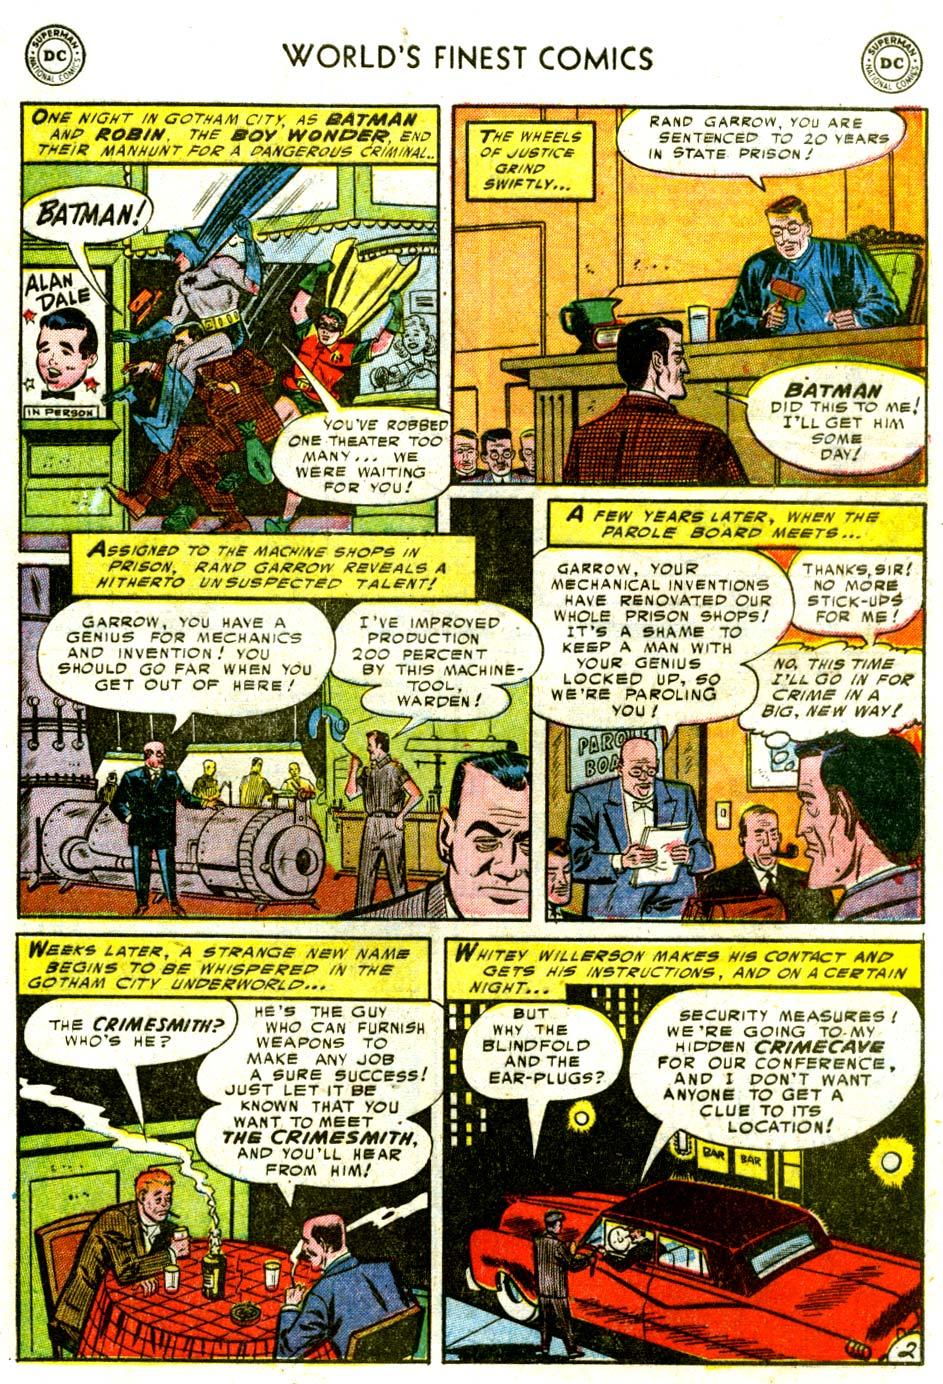 Read online World's Finest Comics comic -  Issue #68 - 55